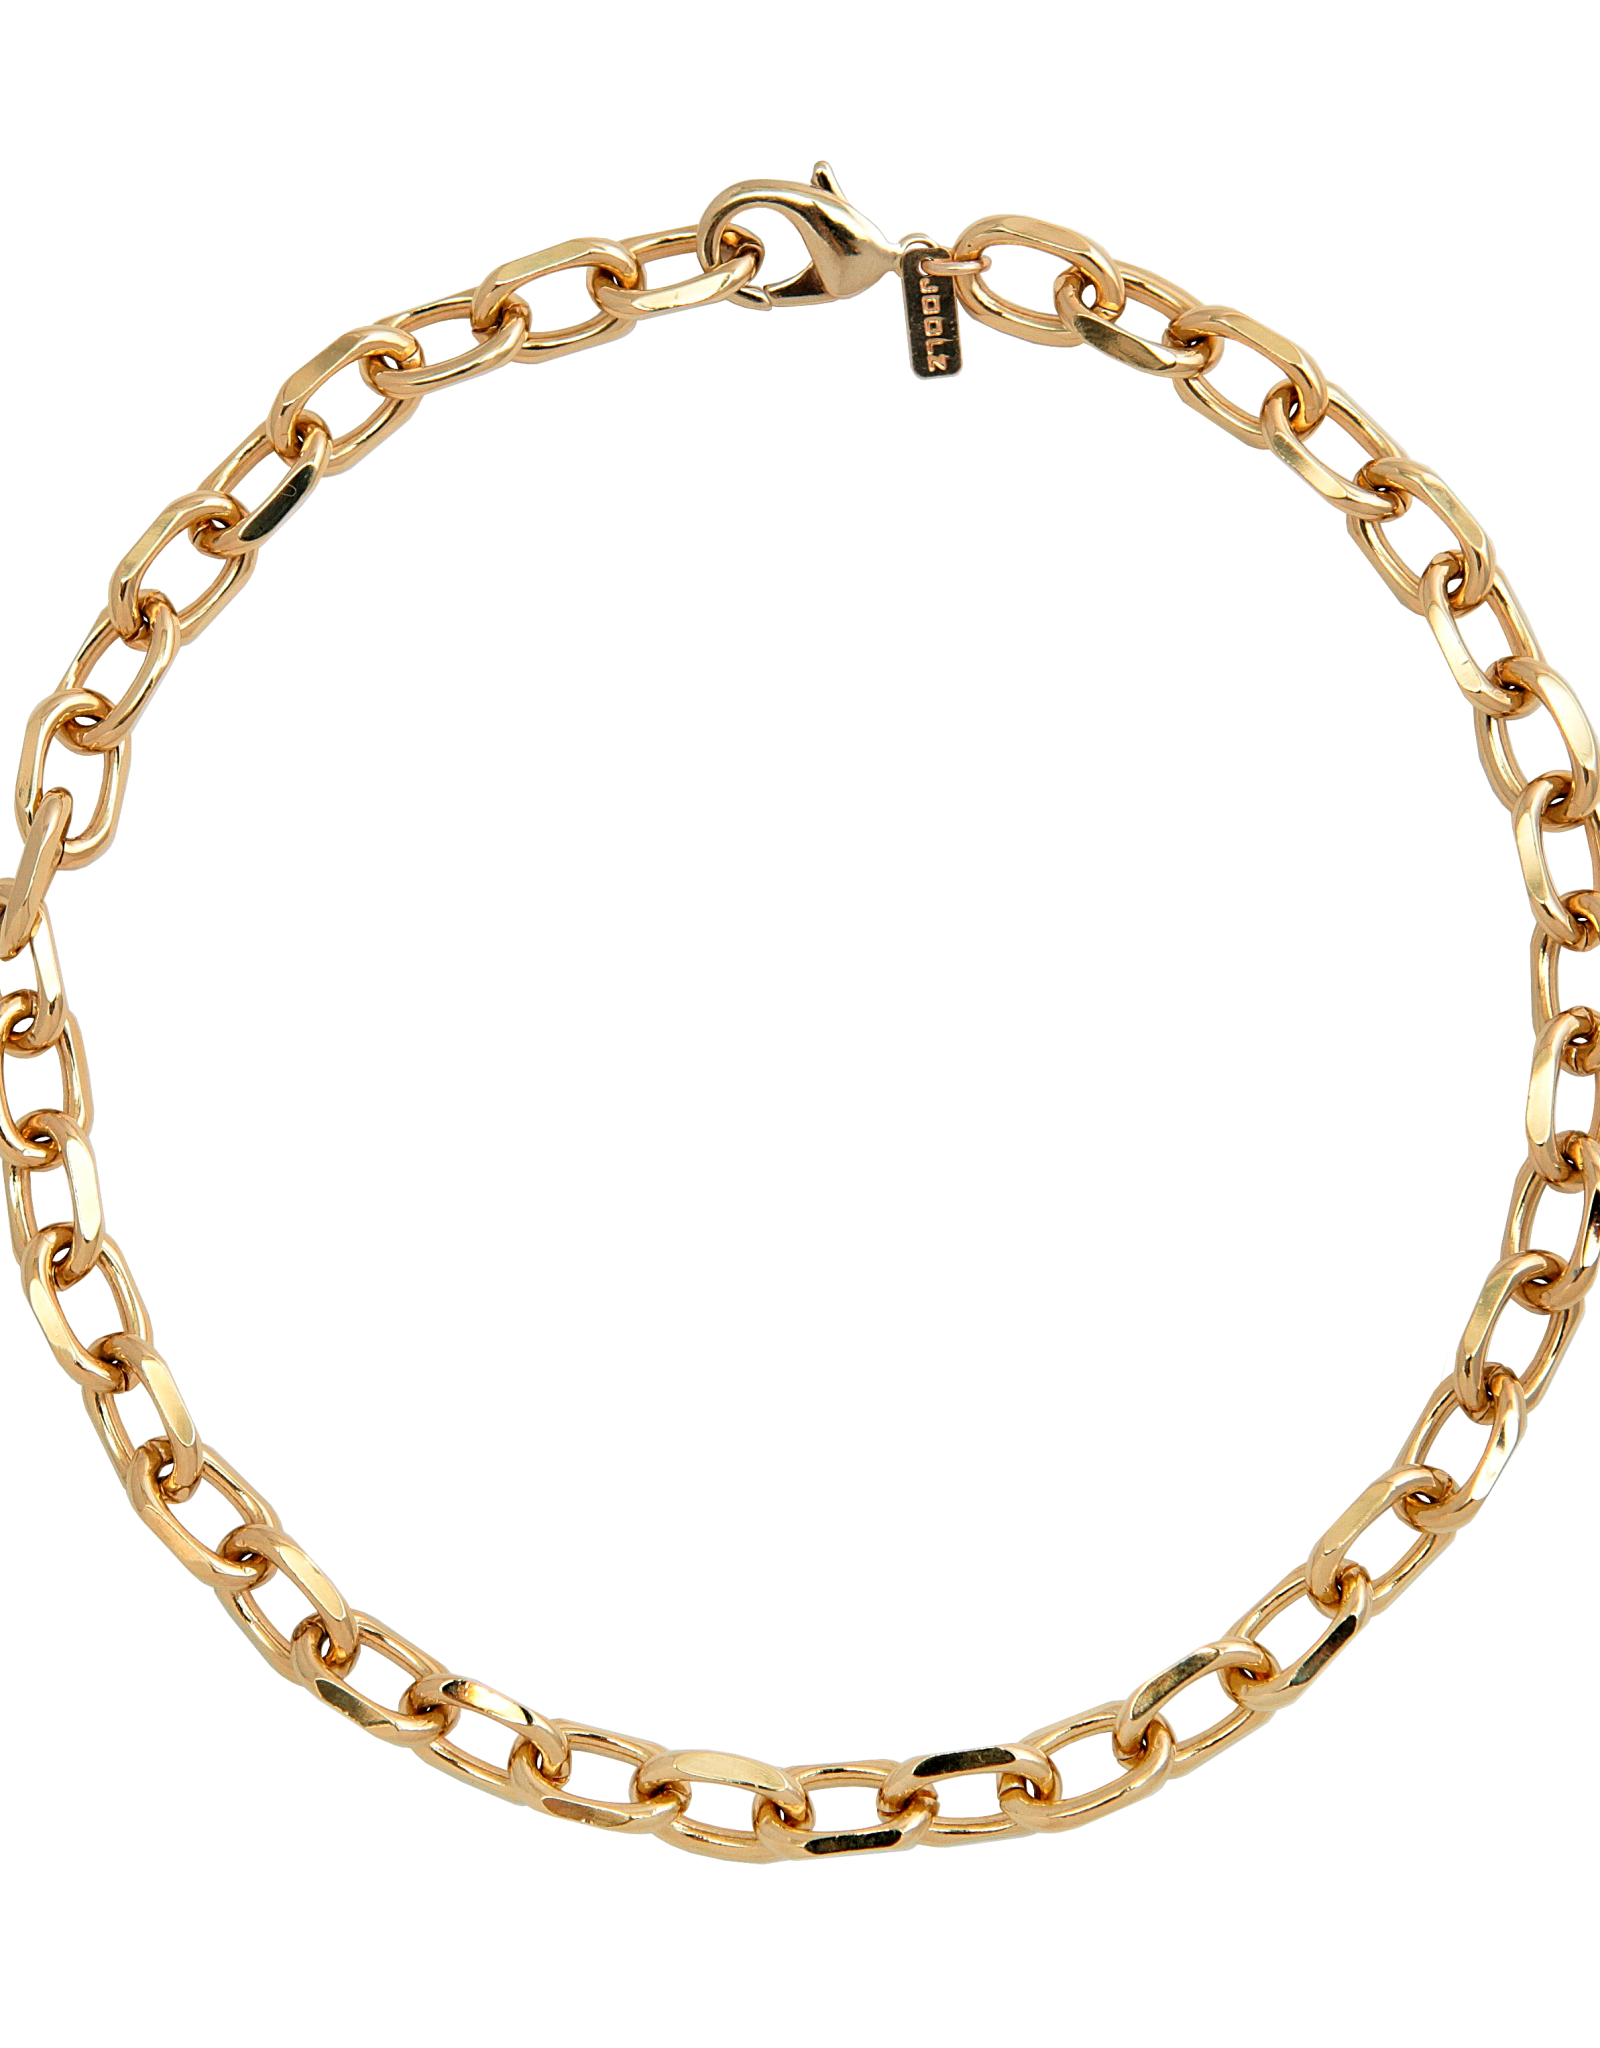 Martha Calvo Celine Chain Link Necklace